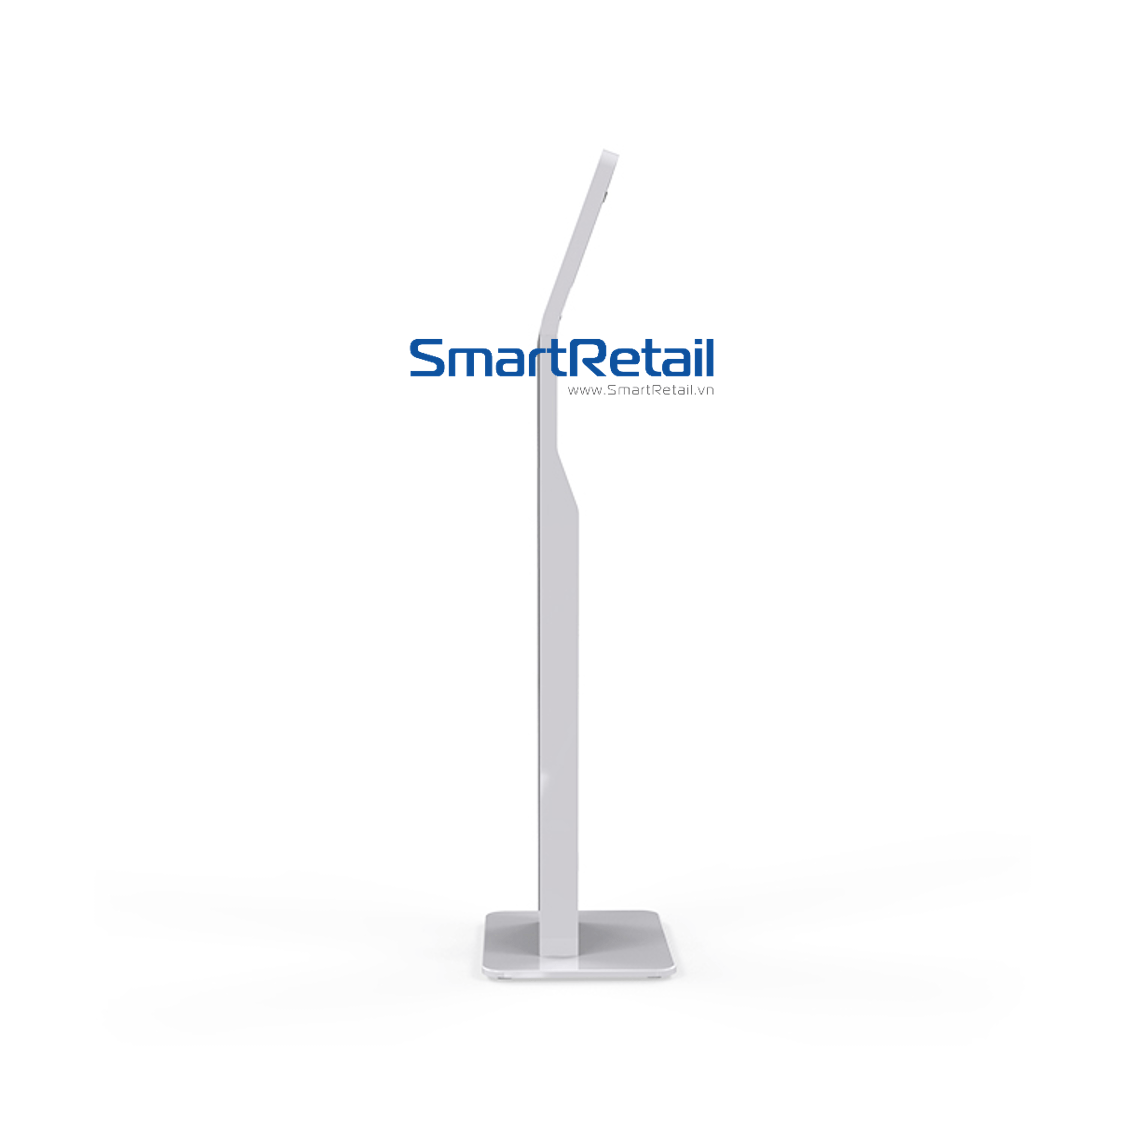 SmartRetail Thiet bi bao ve Tablet SF103 4